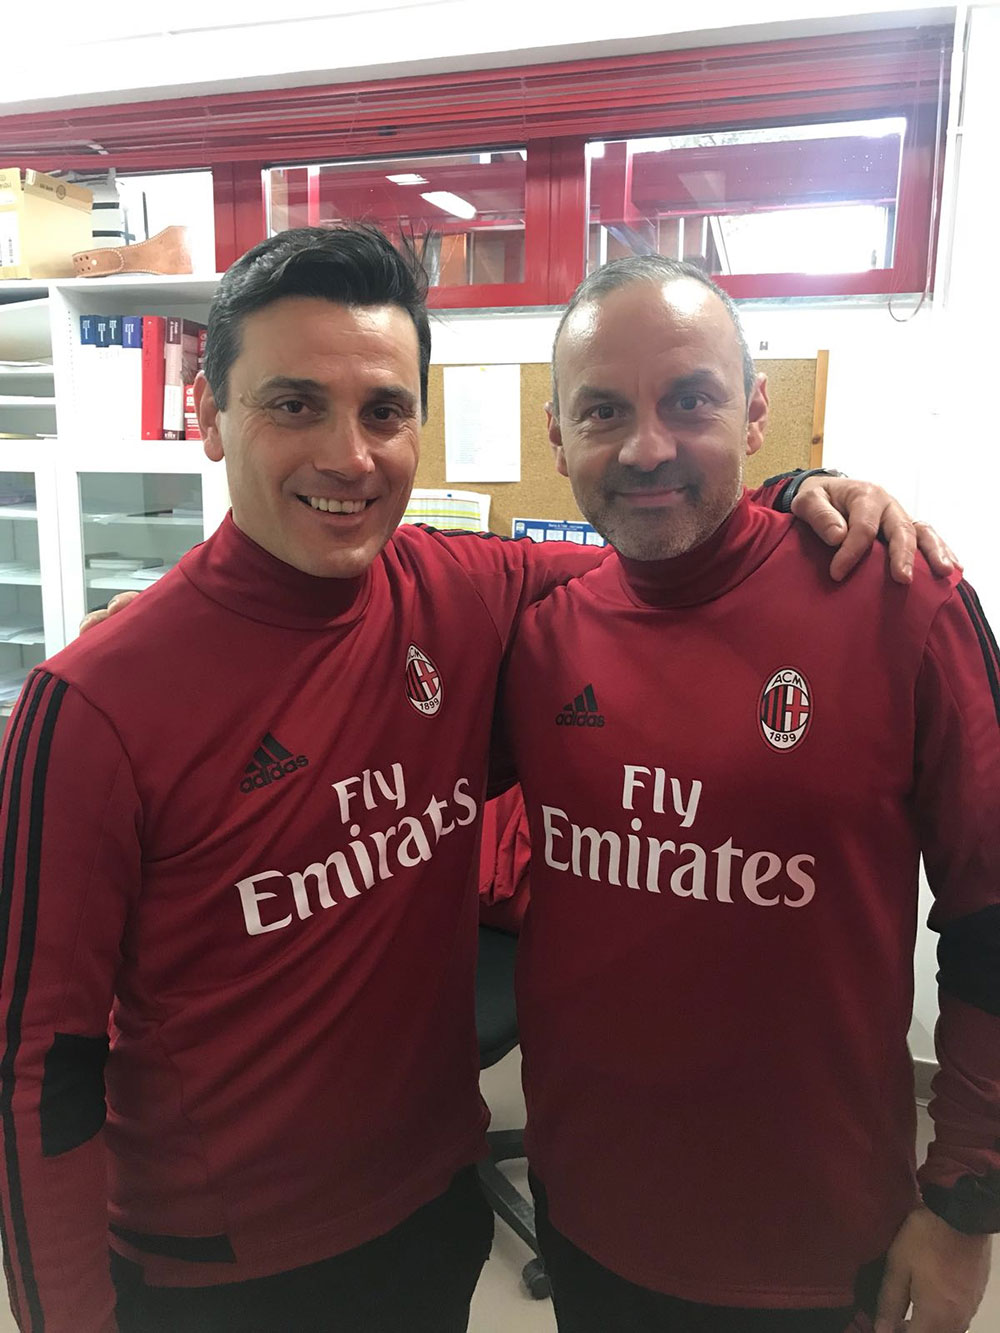 Vincenzo Montella and Mario Innaurato at Milanello on November 15, 2017. (@VMontella)